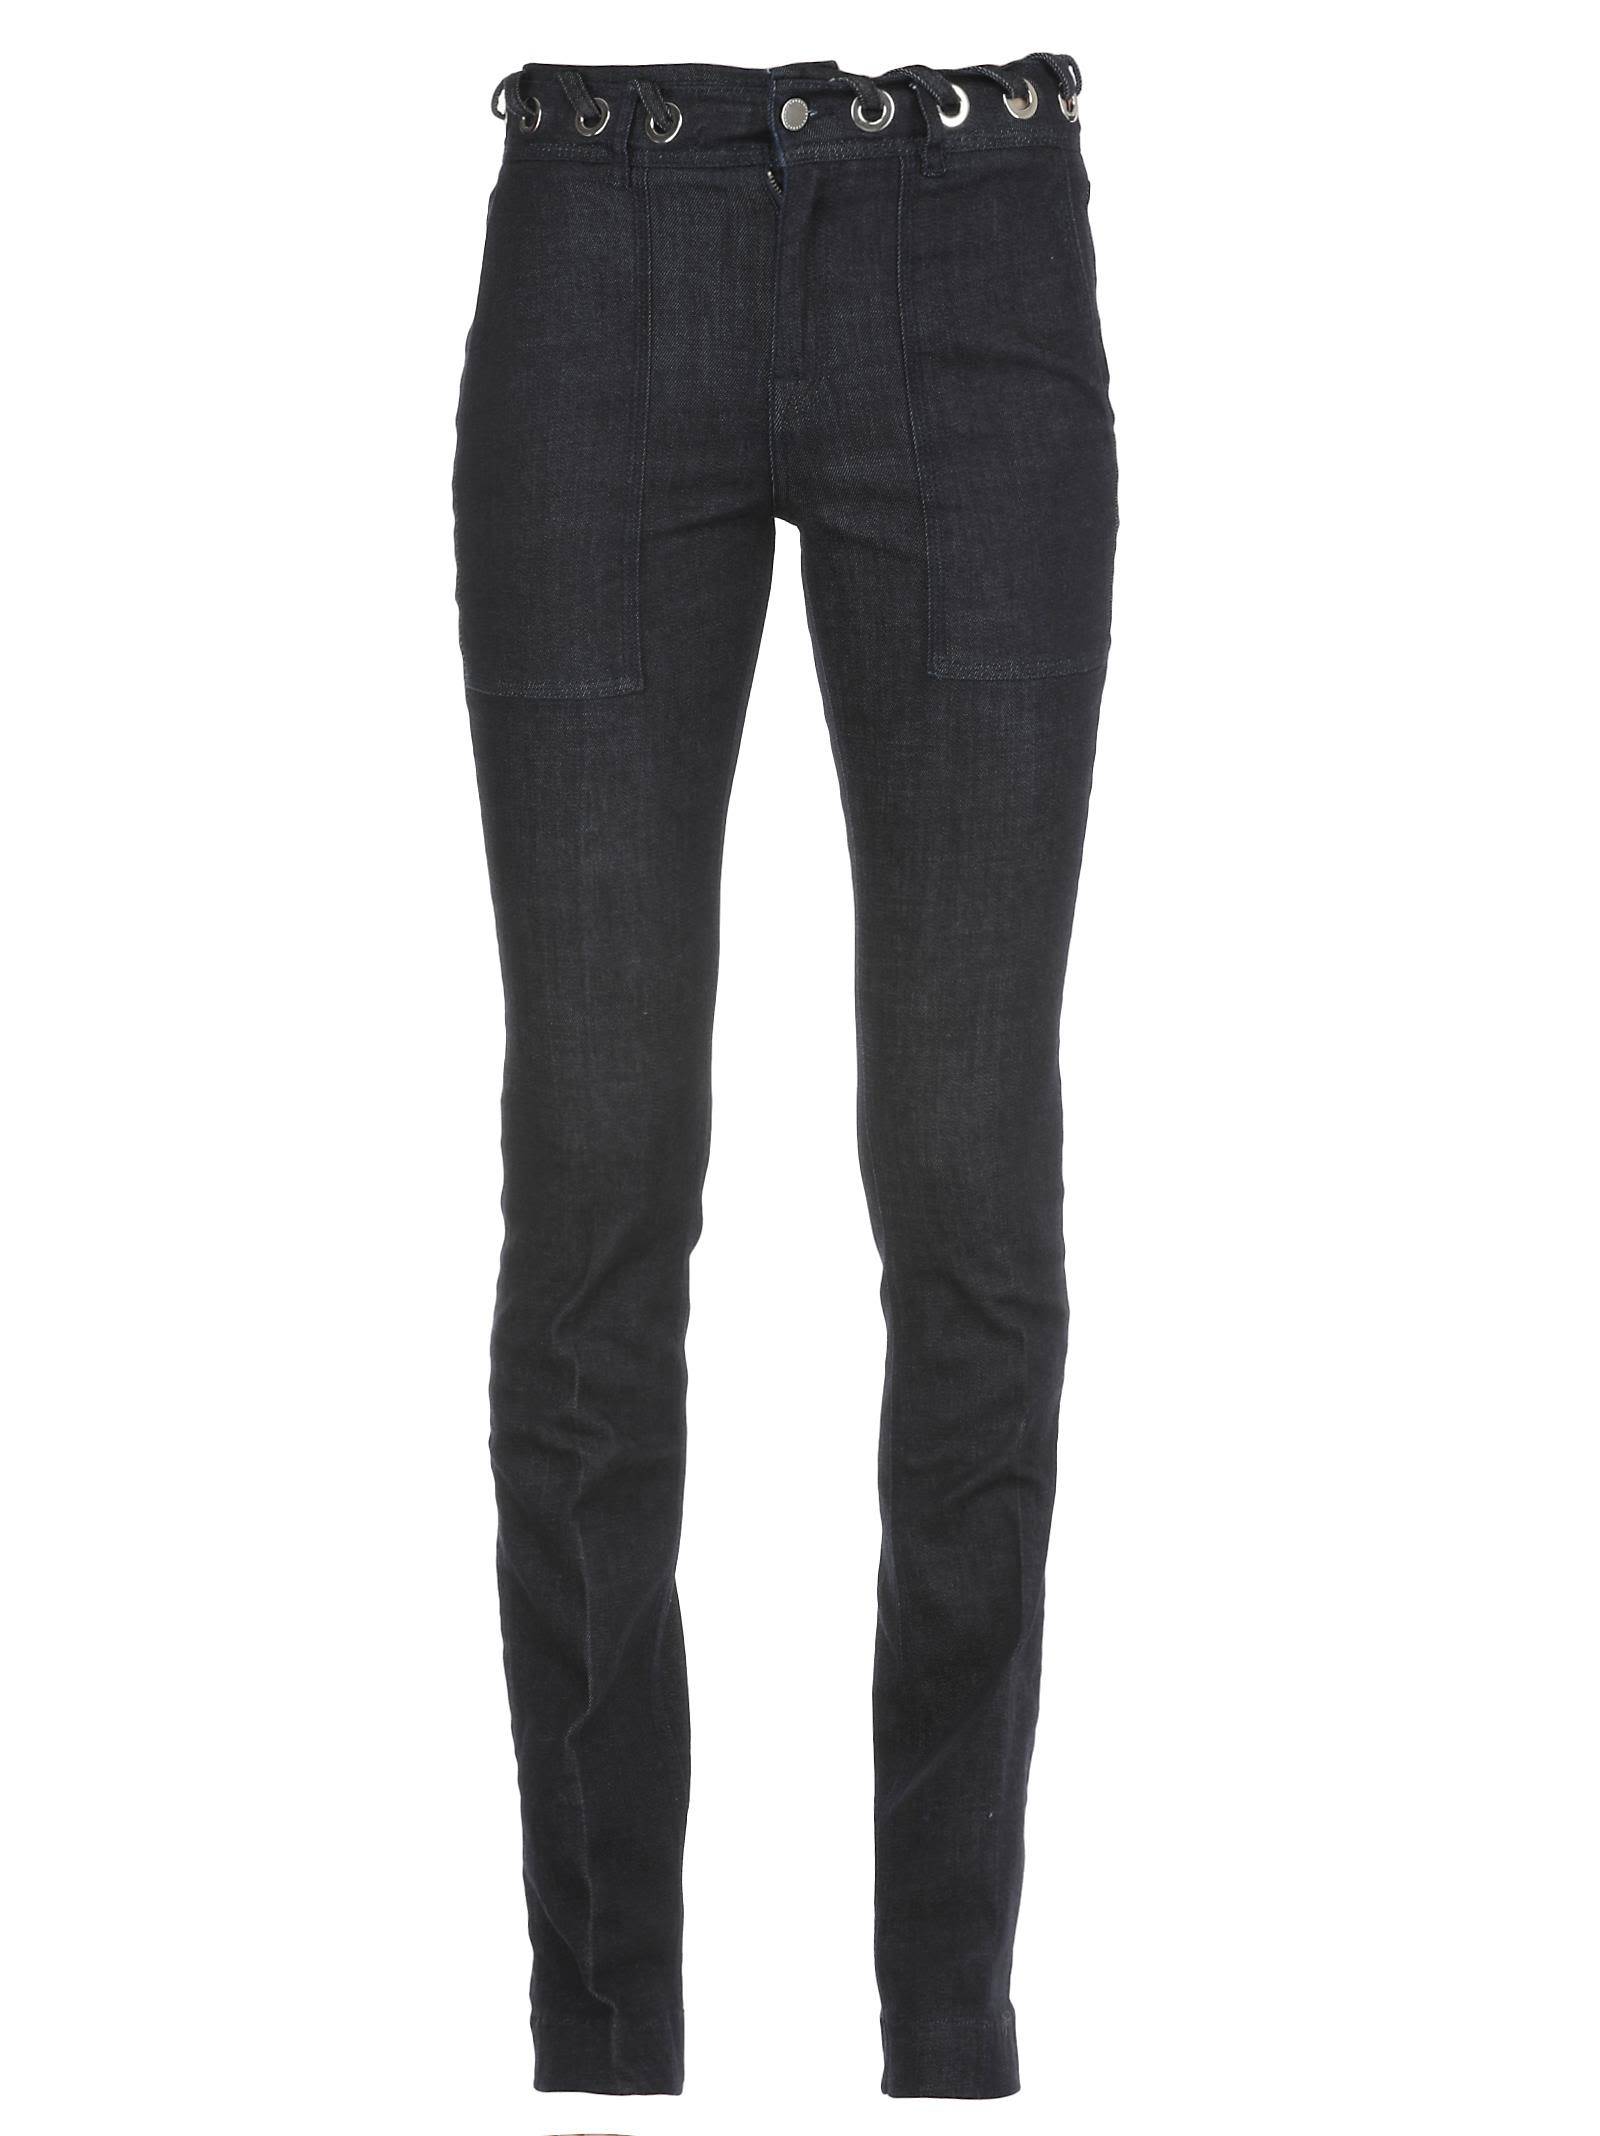 Victoria Victoria Beckham Bootcut Jeans